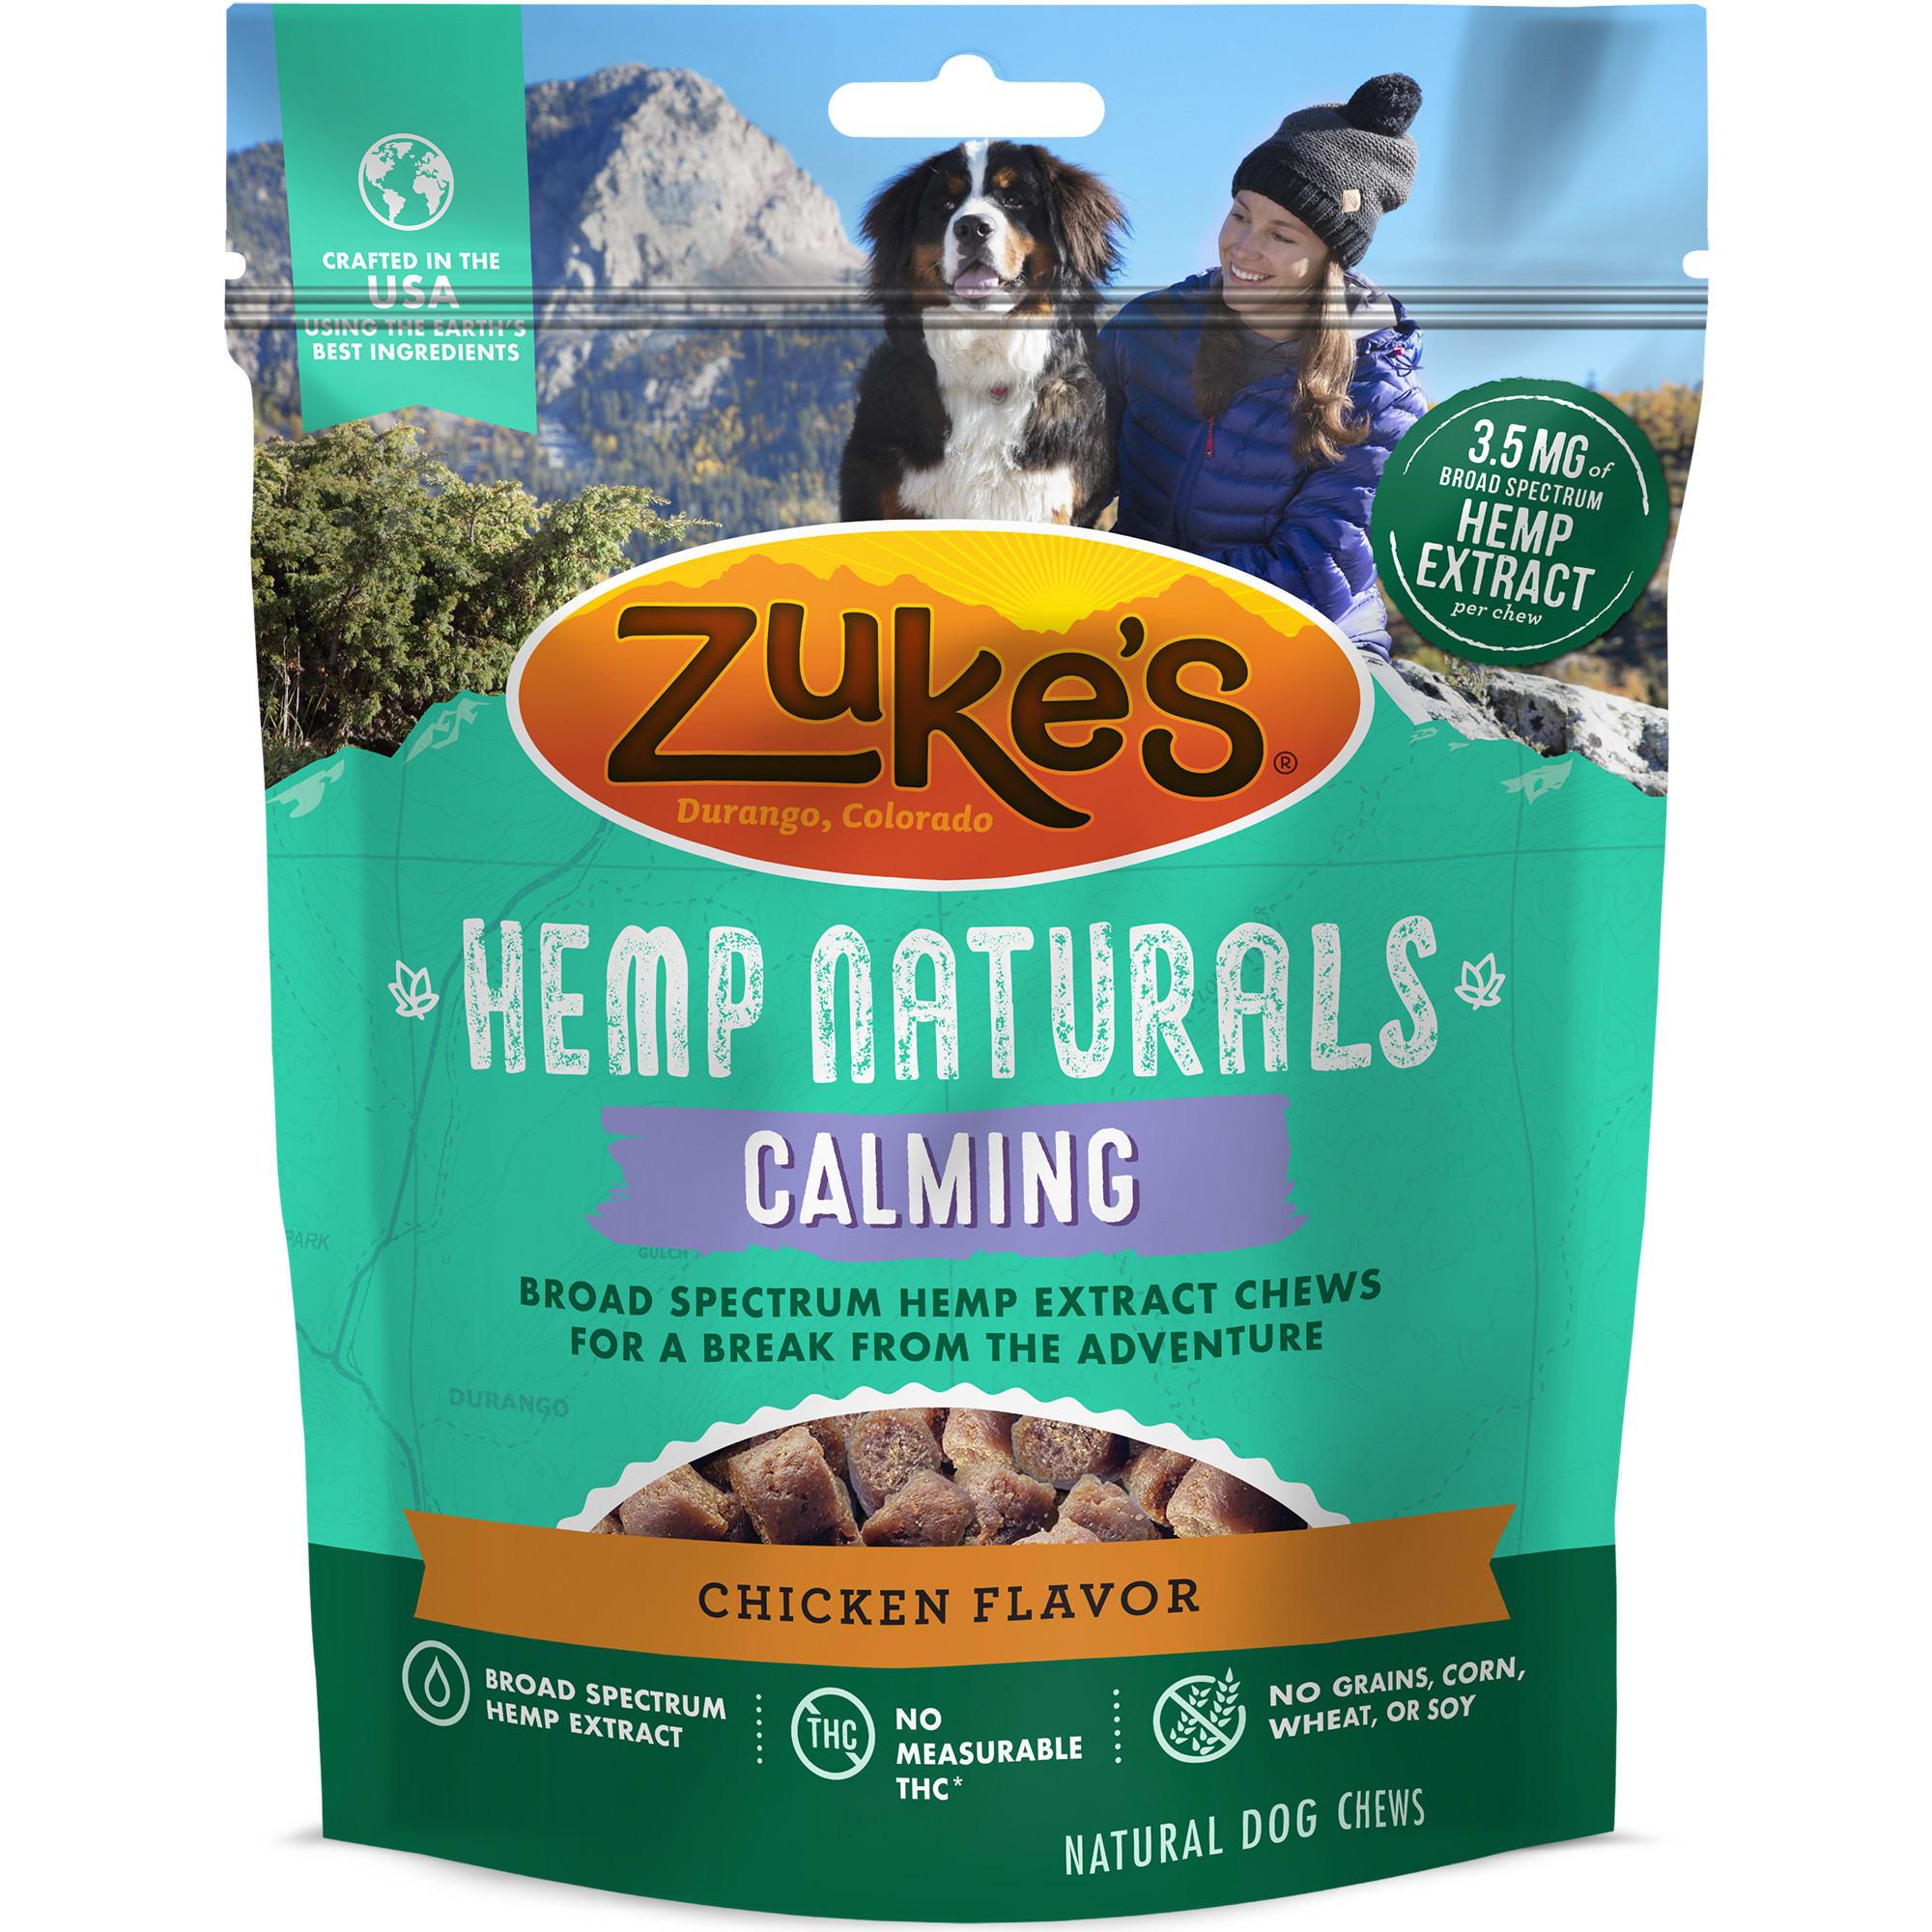 Image of Zuke's Hemp Naturals Calming Chicken Formula Dog Treats, 5 oz.